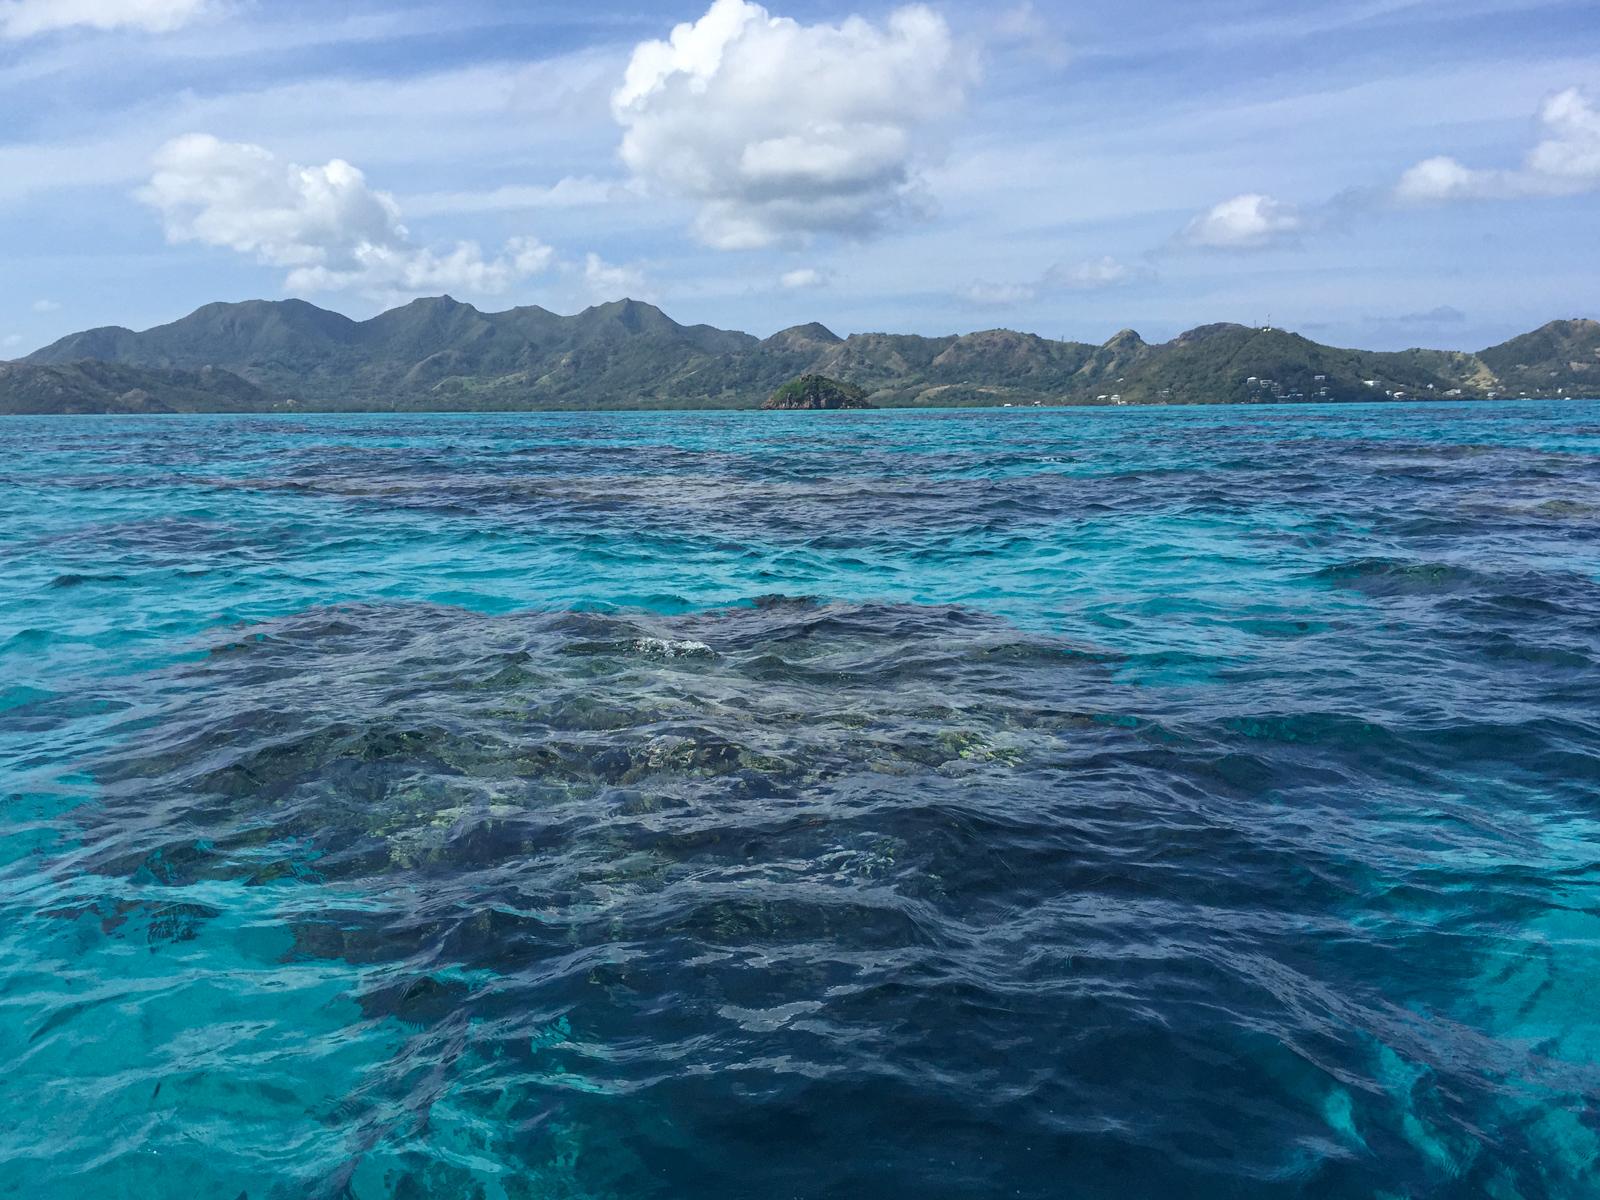 Coral reef near Crab Caye